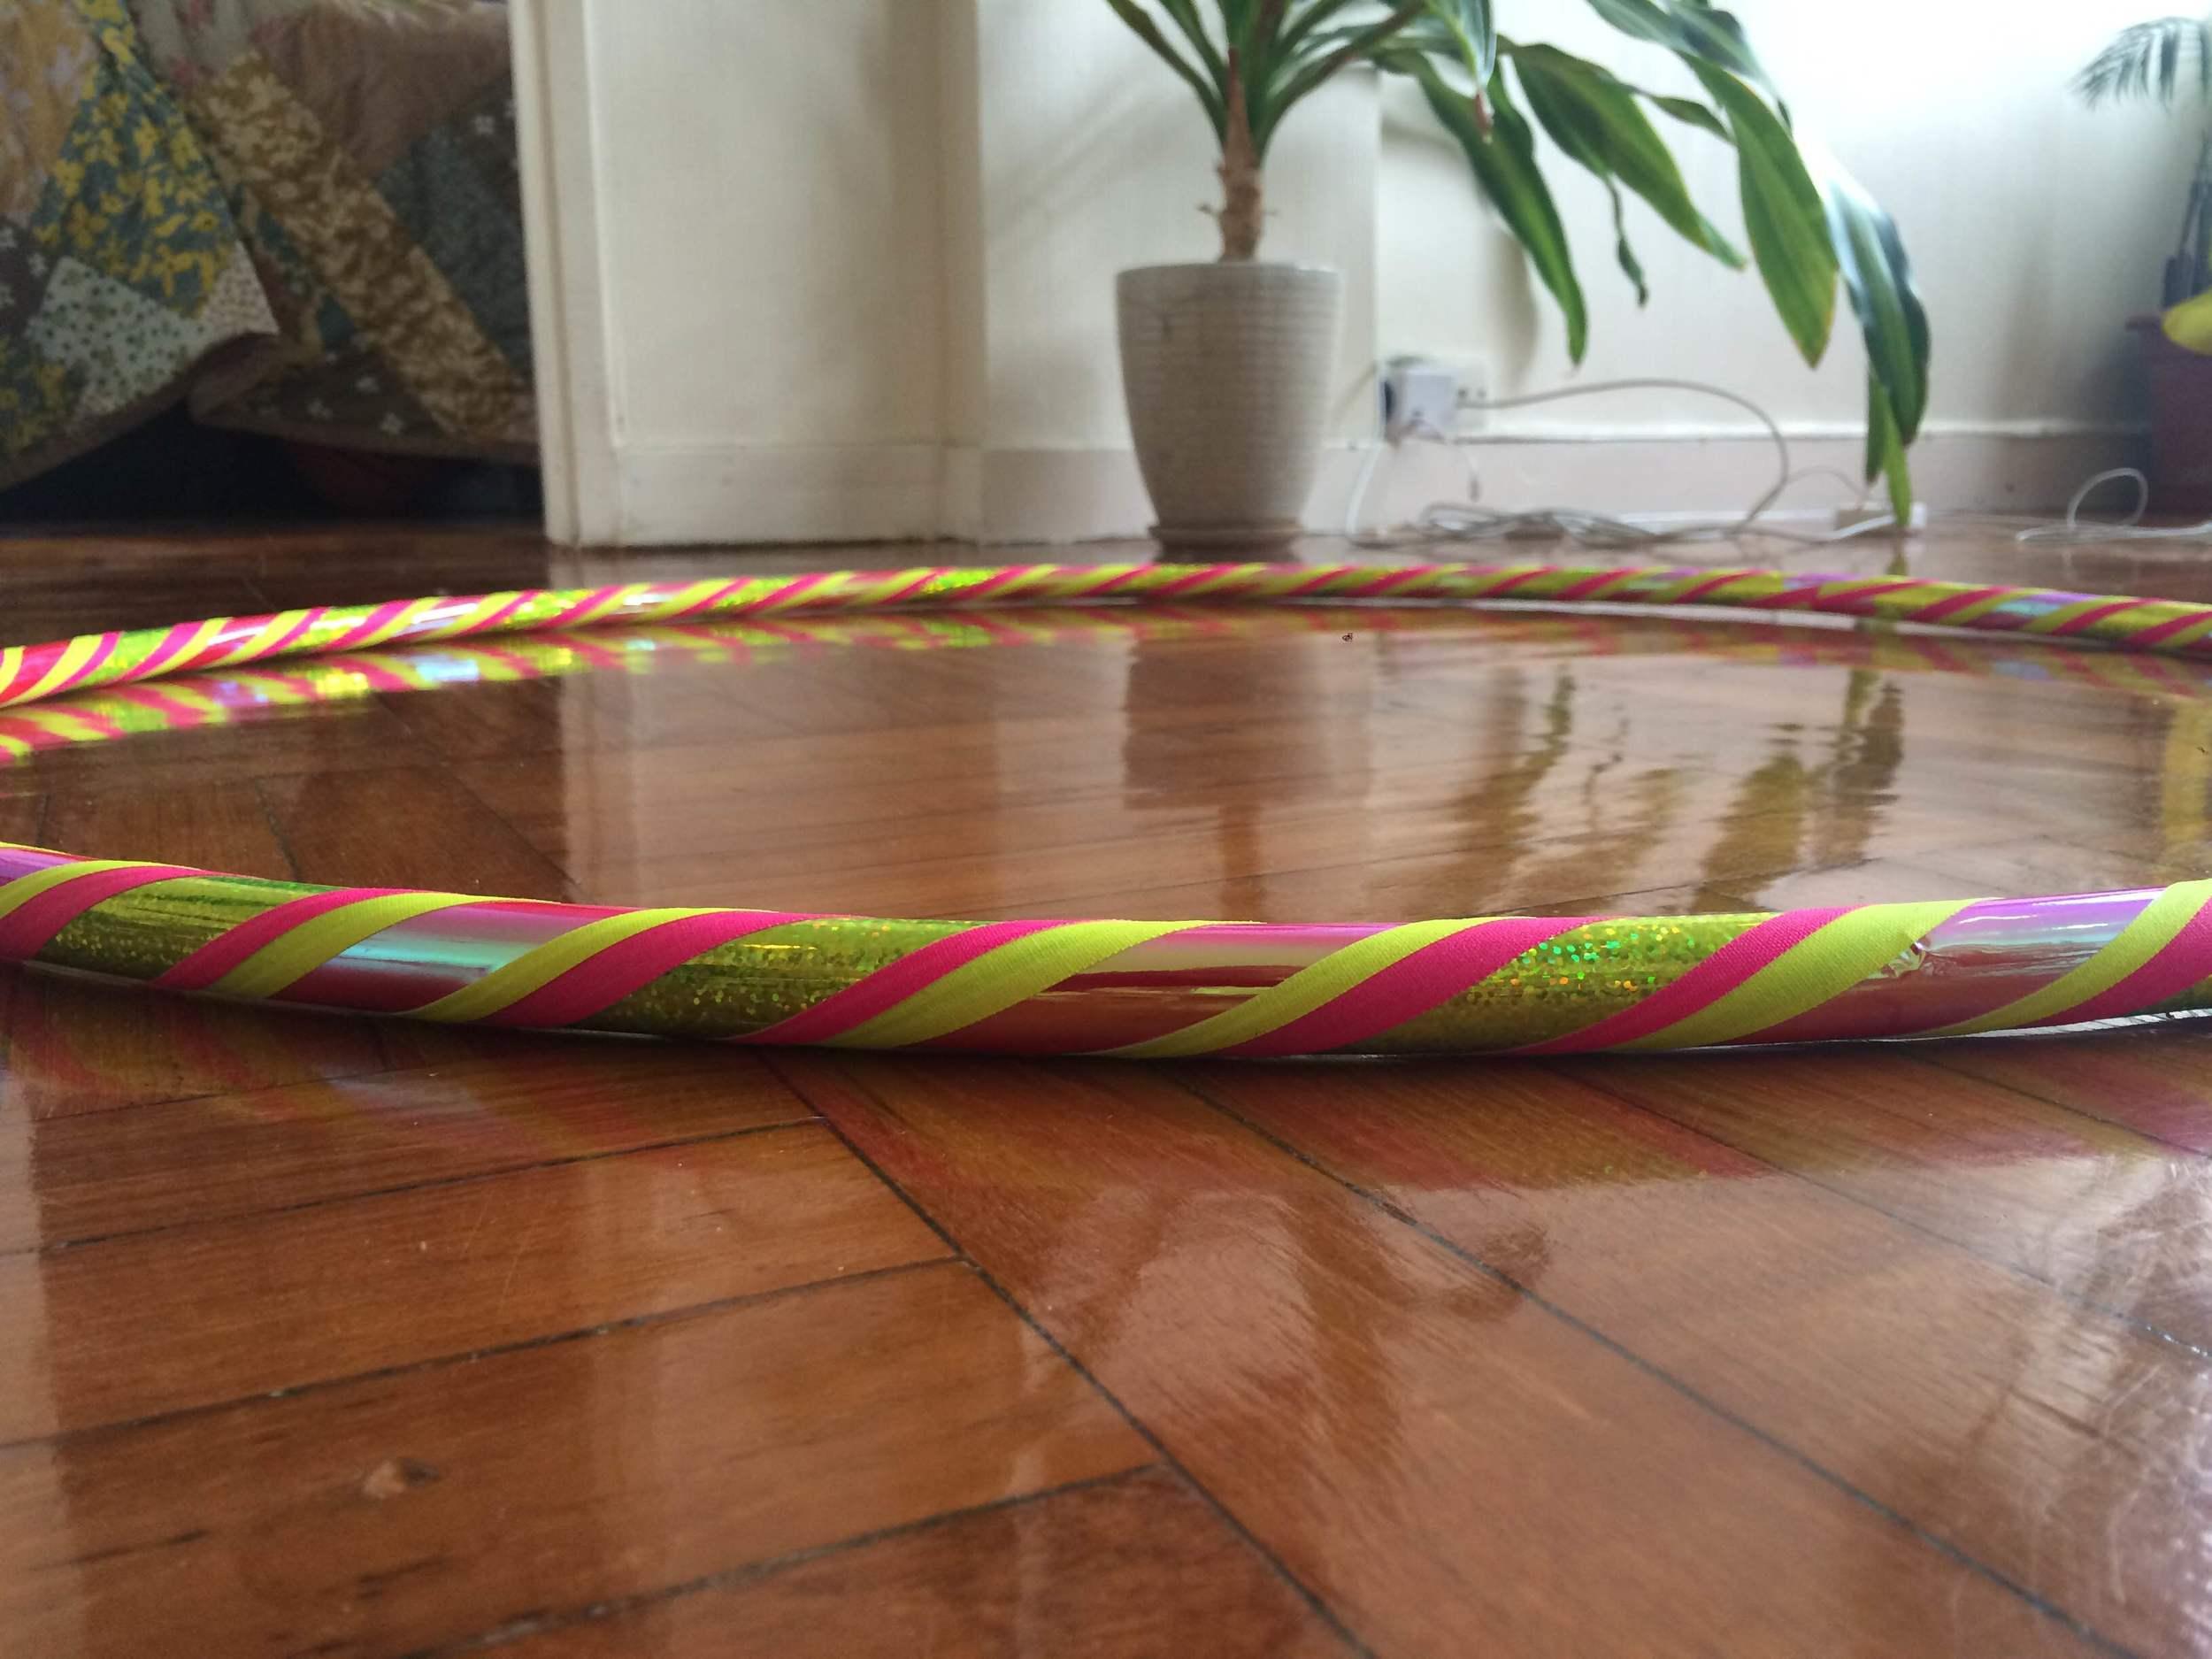 buy a hula hoop hong kong 香港呼啦圈自定